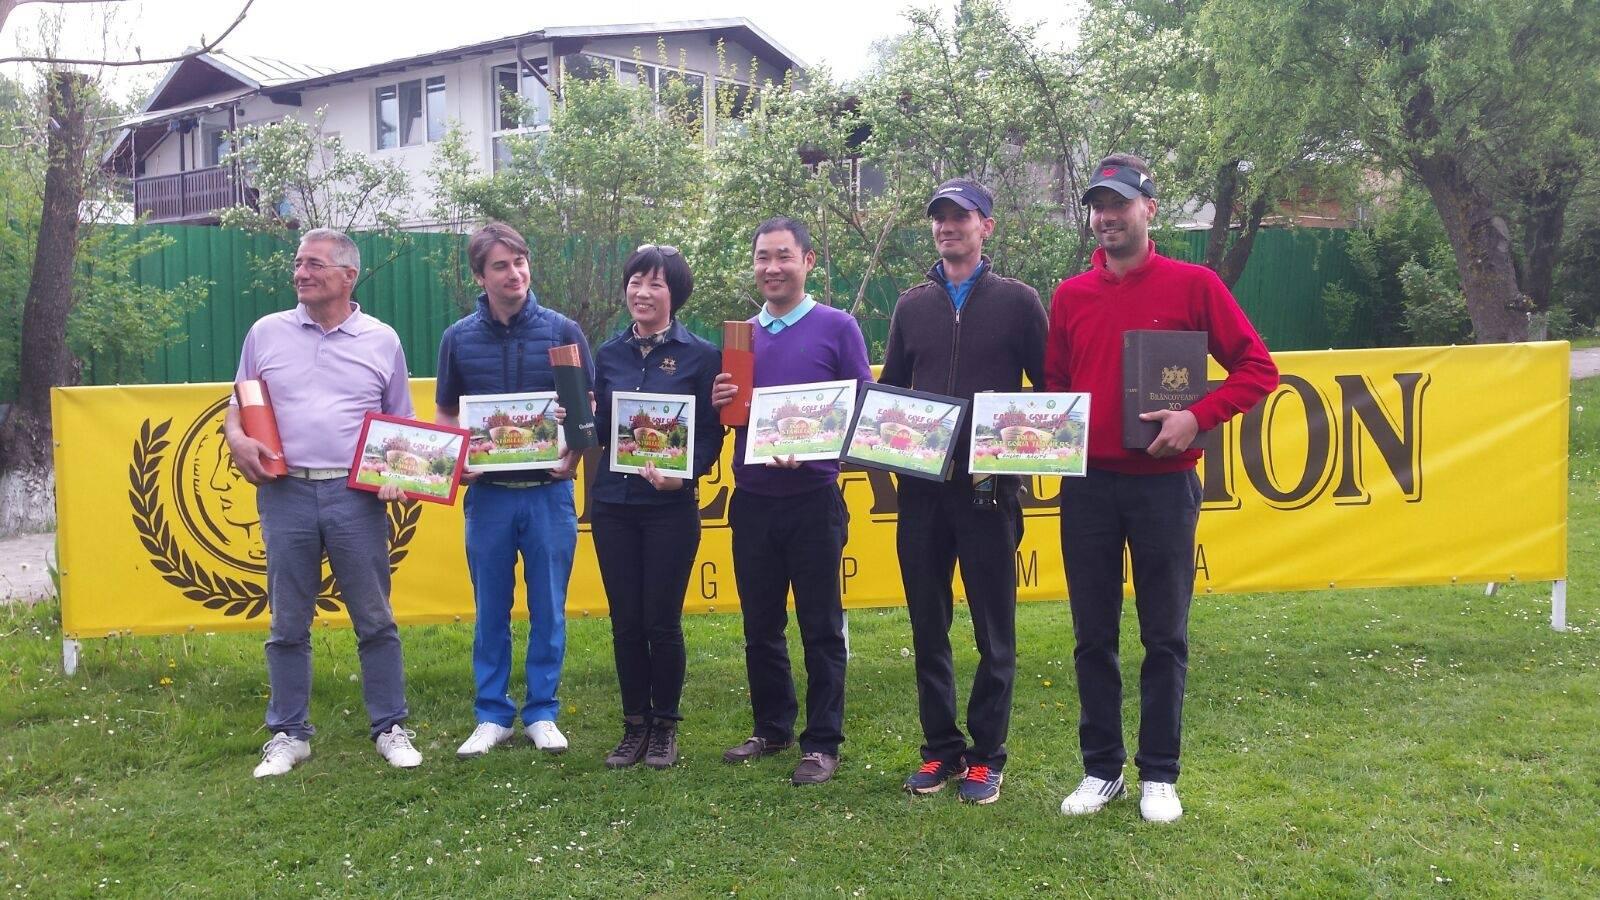 premii golf - alexandrion grup